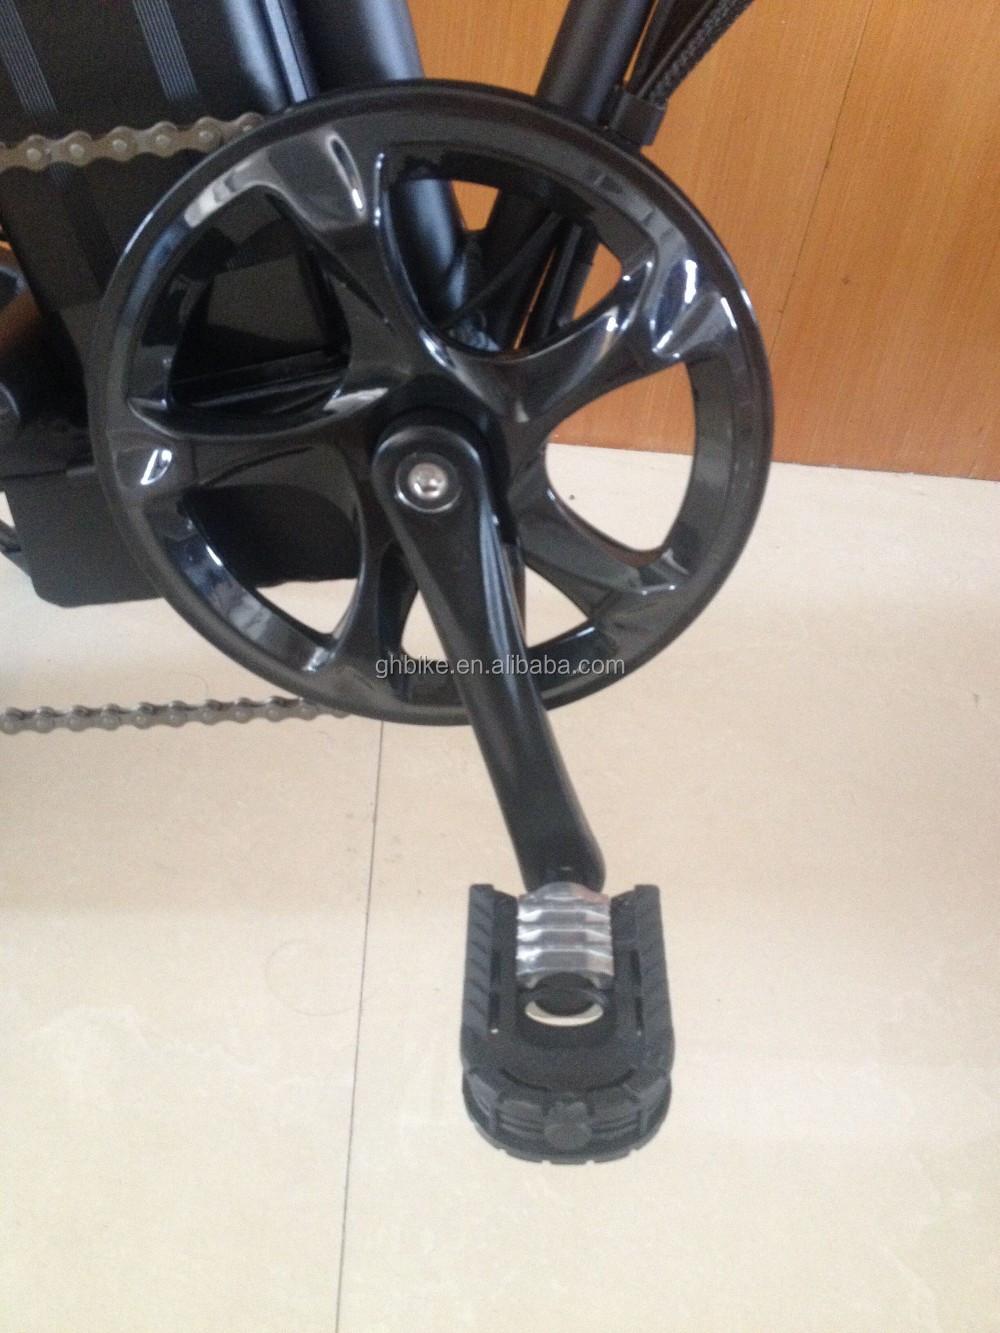 crank set and pedal.jpg